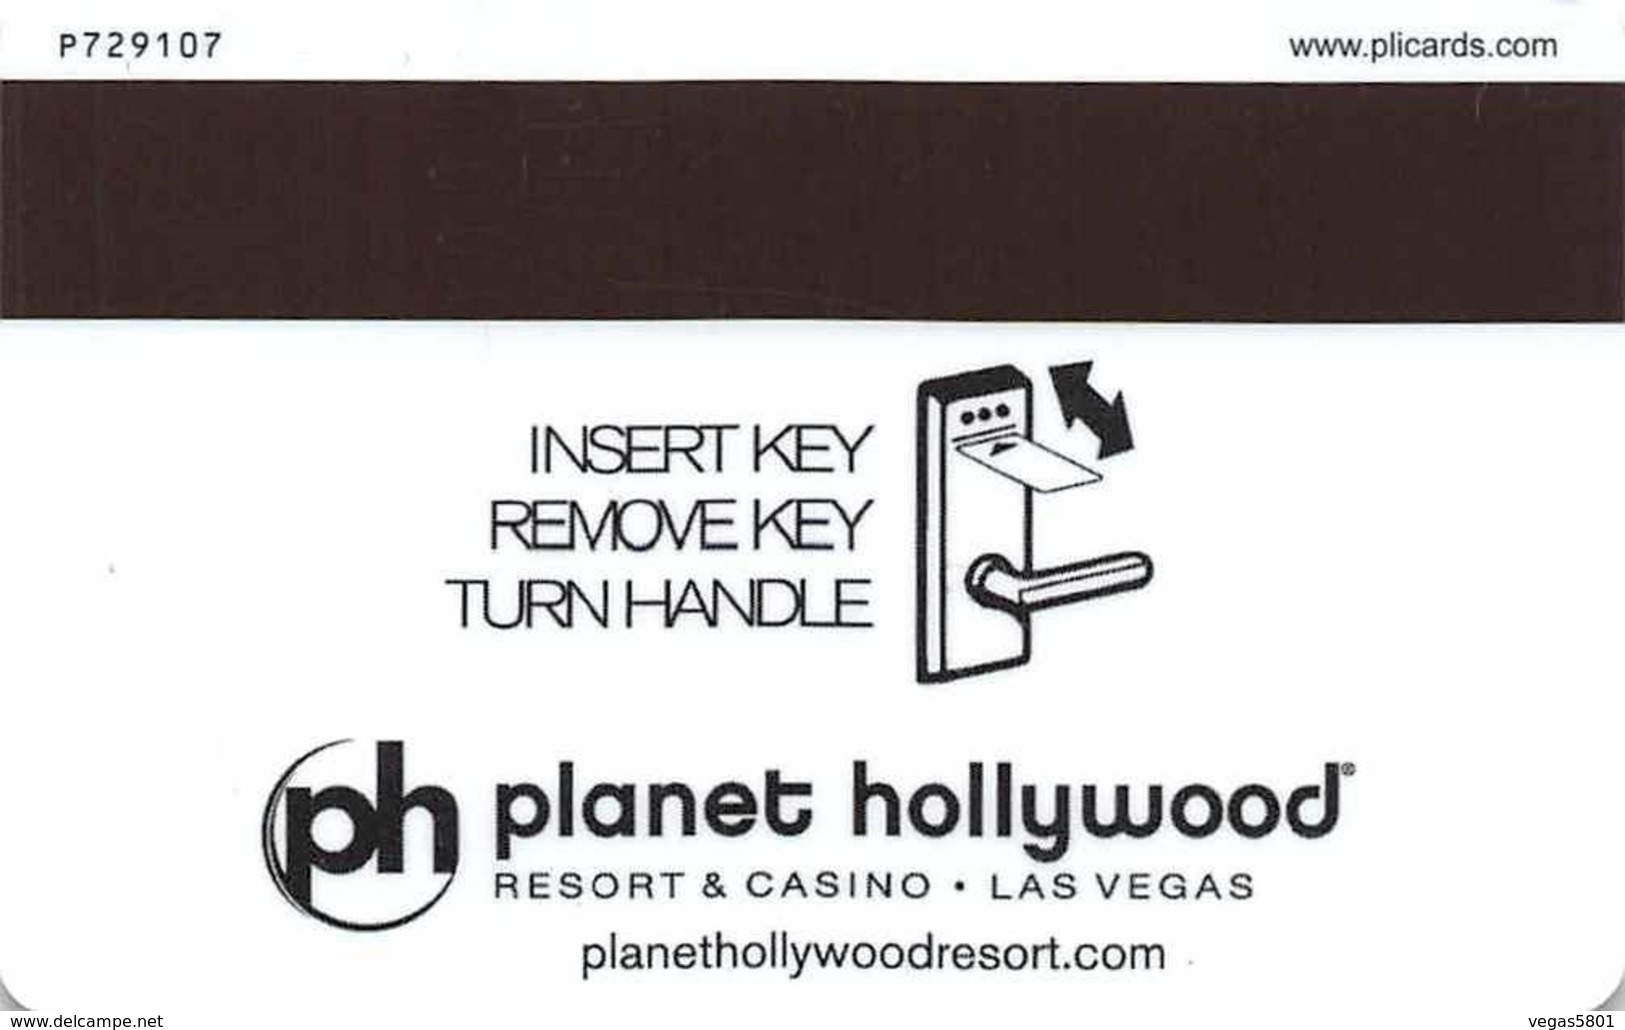 PLANET HOLLYWOOD - Hotel & Casino, Las Vegas - Hotel Room Key Card, Hotelkarte, Schlüsselkarte, Clé De L'Hôtel - Hotelkarten